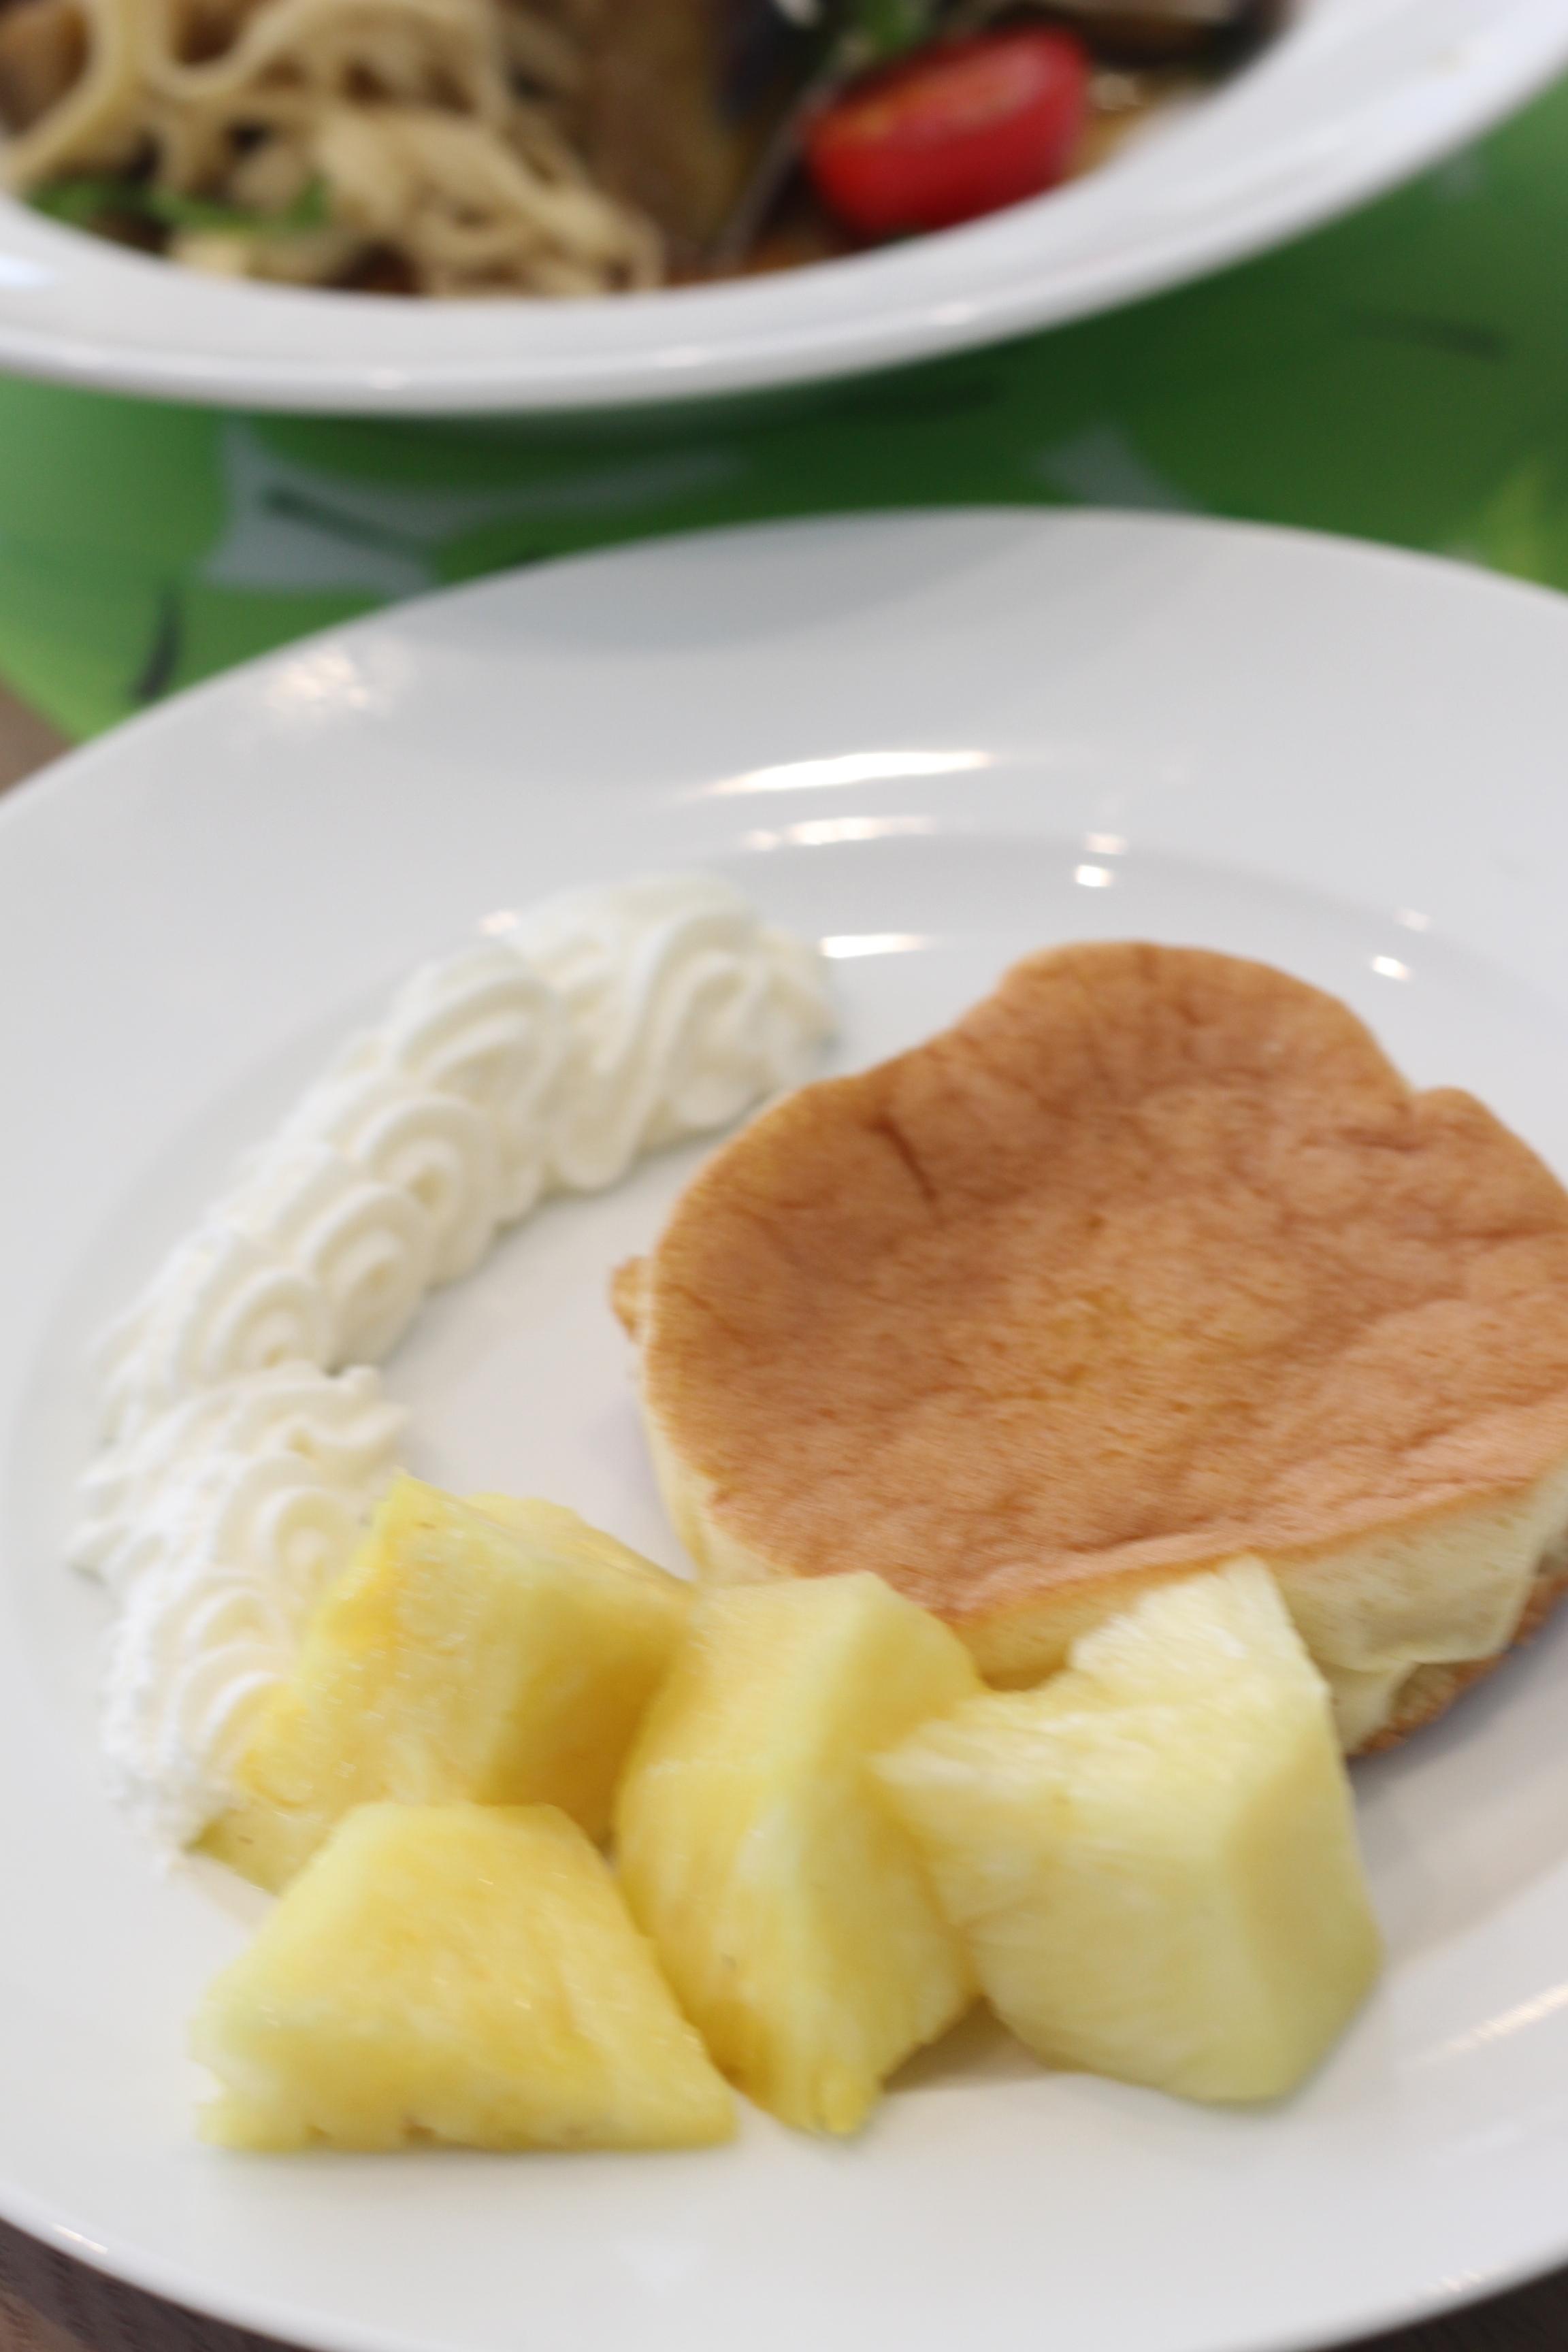 a-ta-sante 糖質制限パン料理教室、阿倍野区西田辺、京都江部粉麺ミックスで『水ナスの花山椒風味の冷製パスタ』3回目開催。